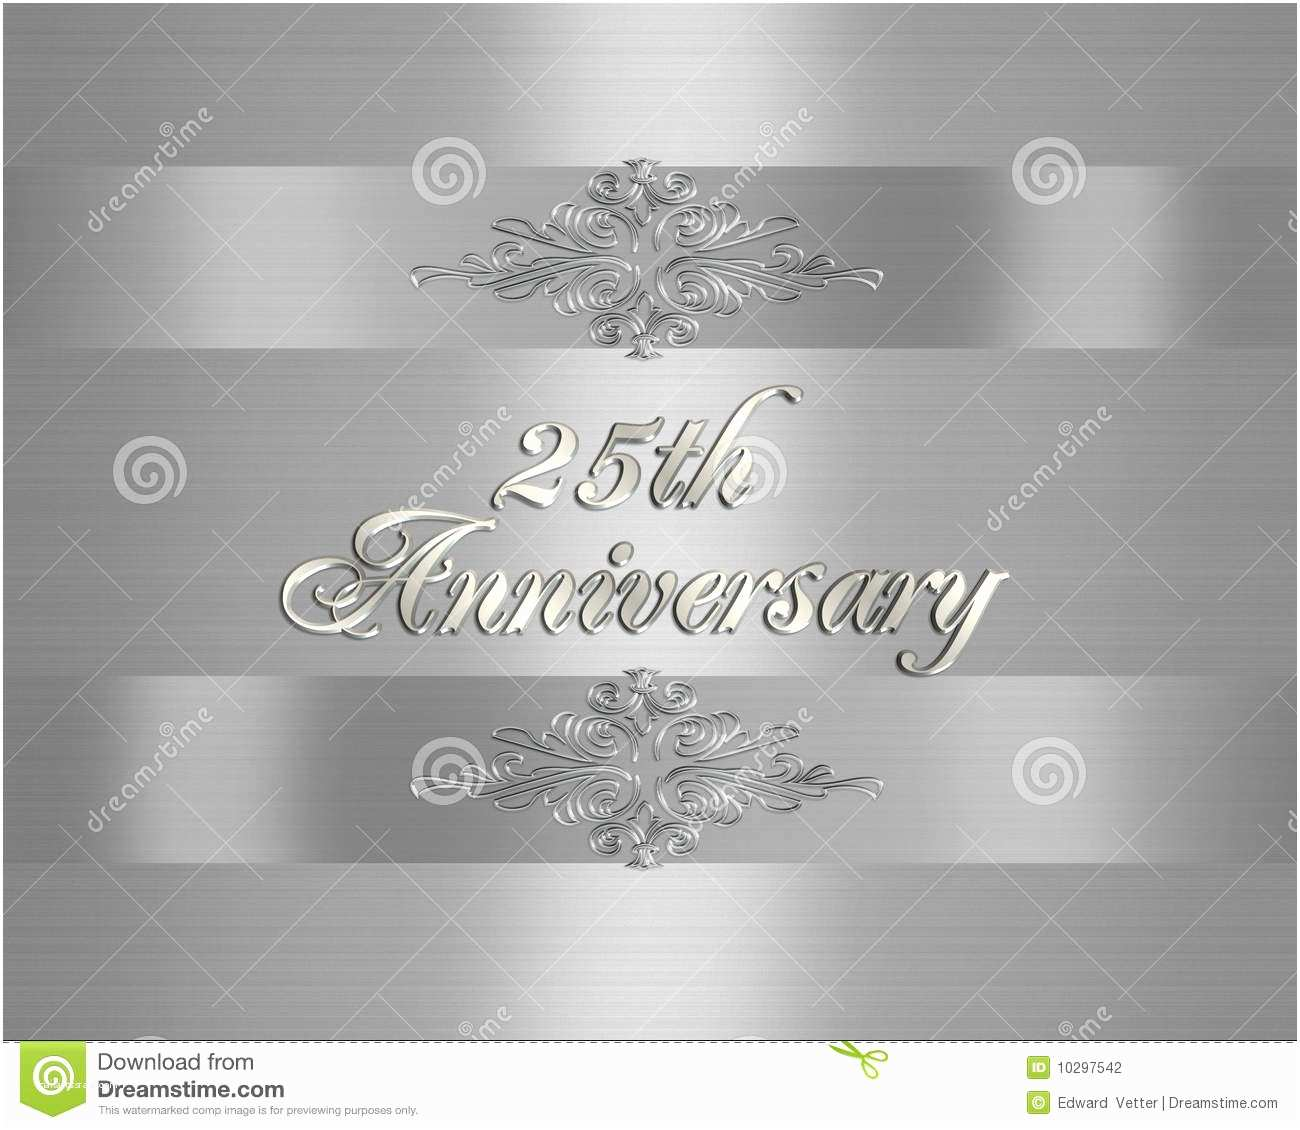 25th Wedding Anniversary Invitation Cards Free Download 25th Wedding Anniversary Invitation Stock